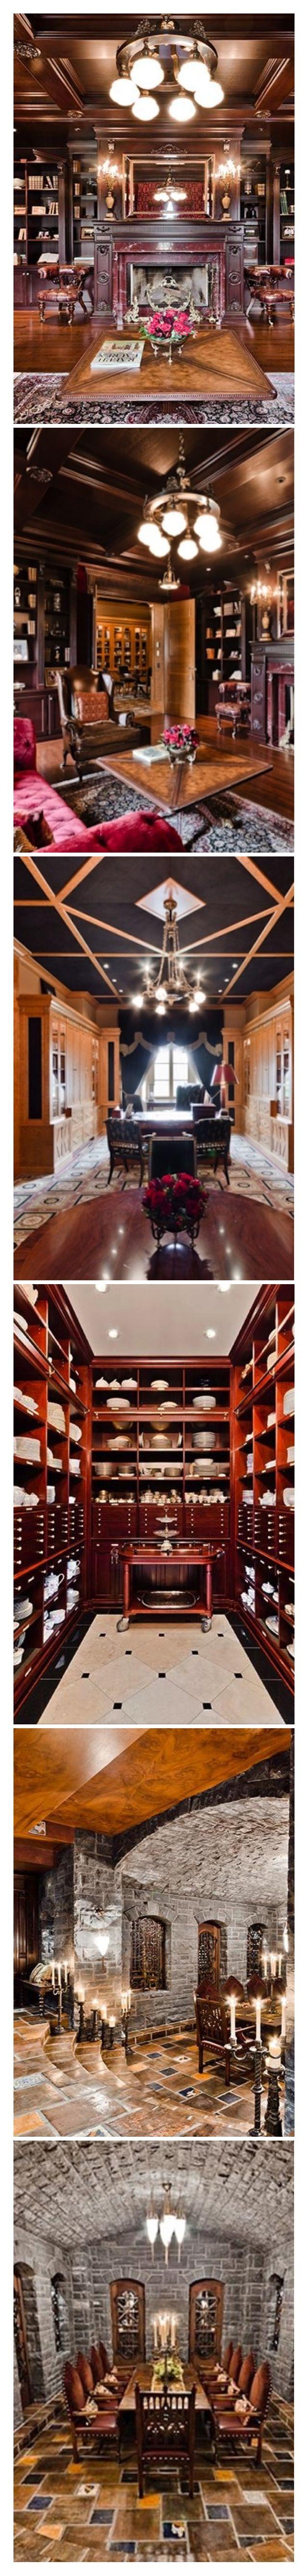 Celine Dion's Mansion for sale - Collage by #Luxurydotcom  http://designgallerist.com/blog/